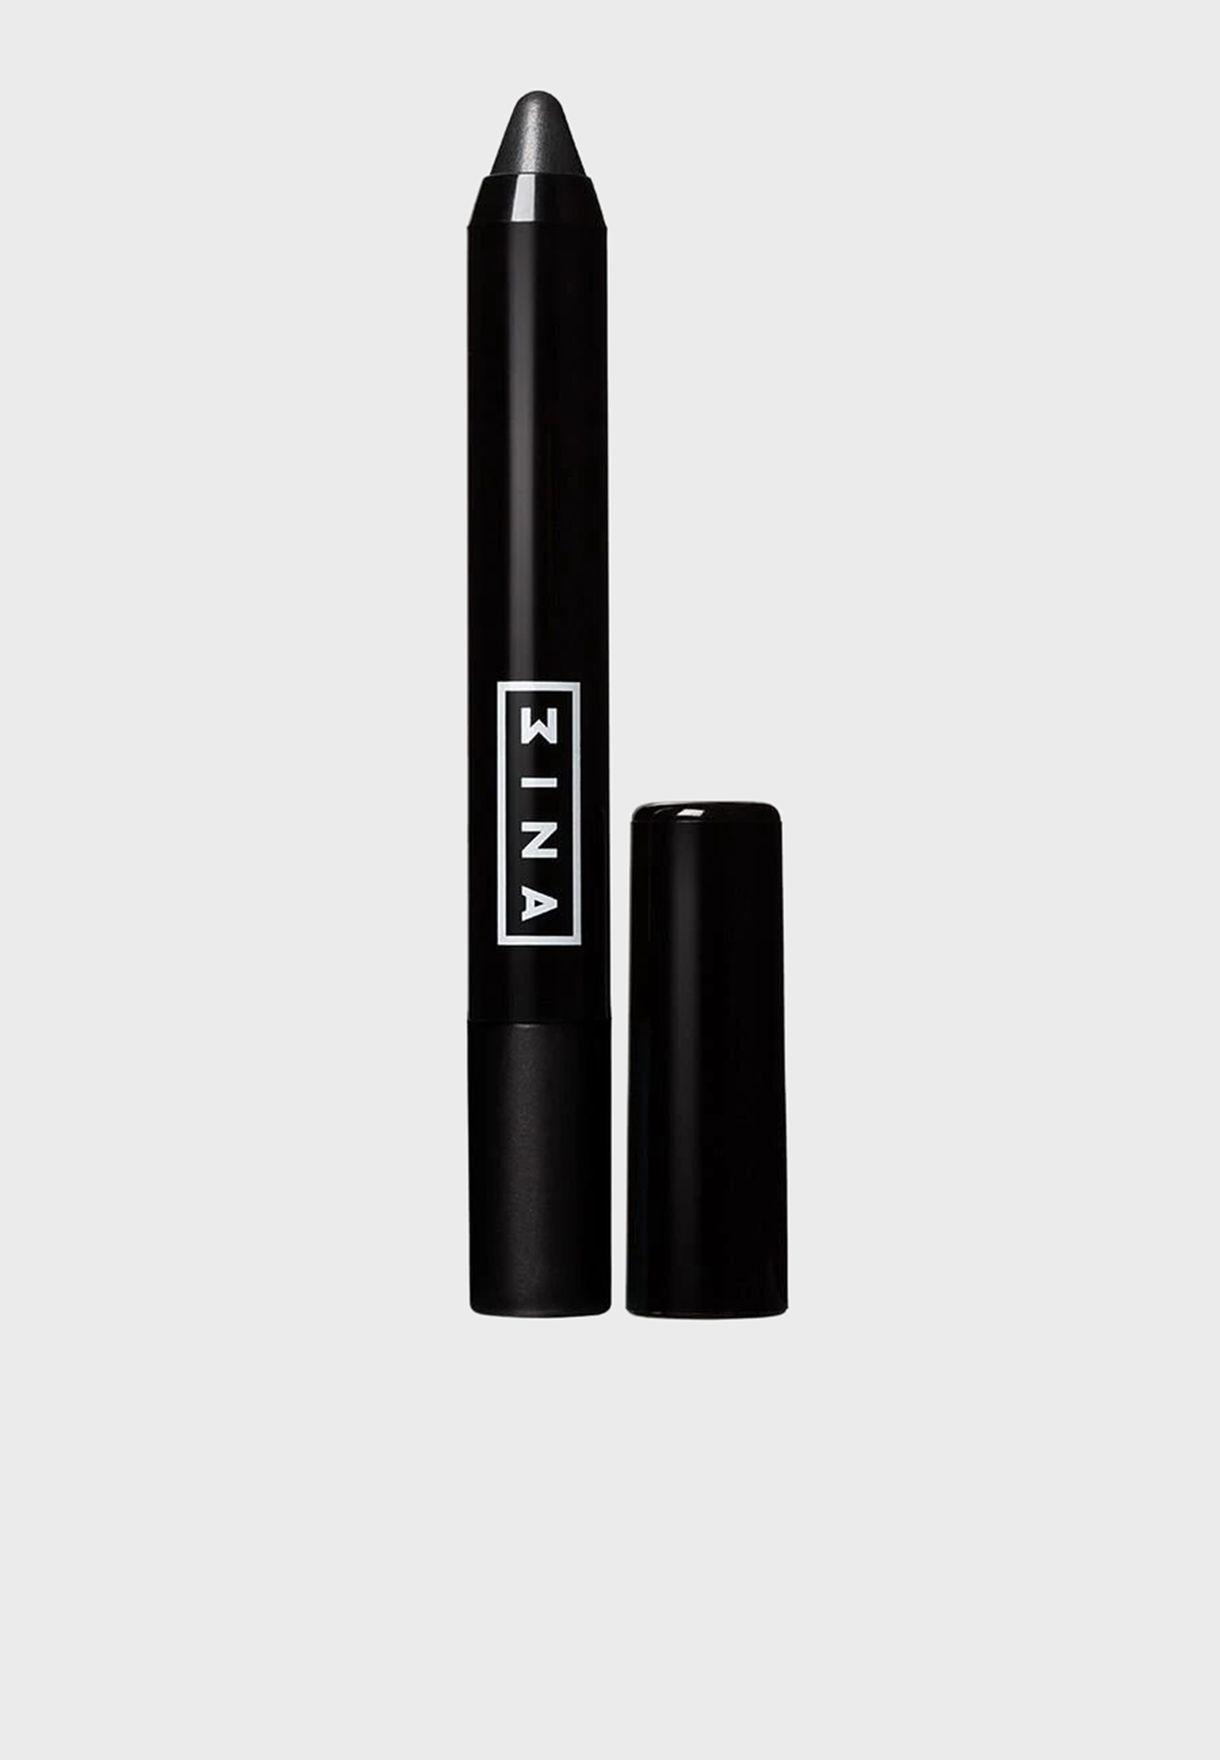 The Pencil Eyeshadow 110